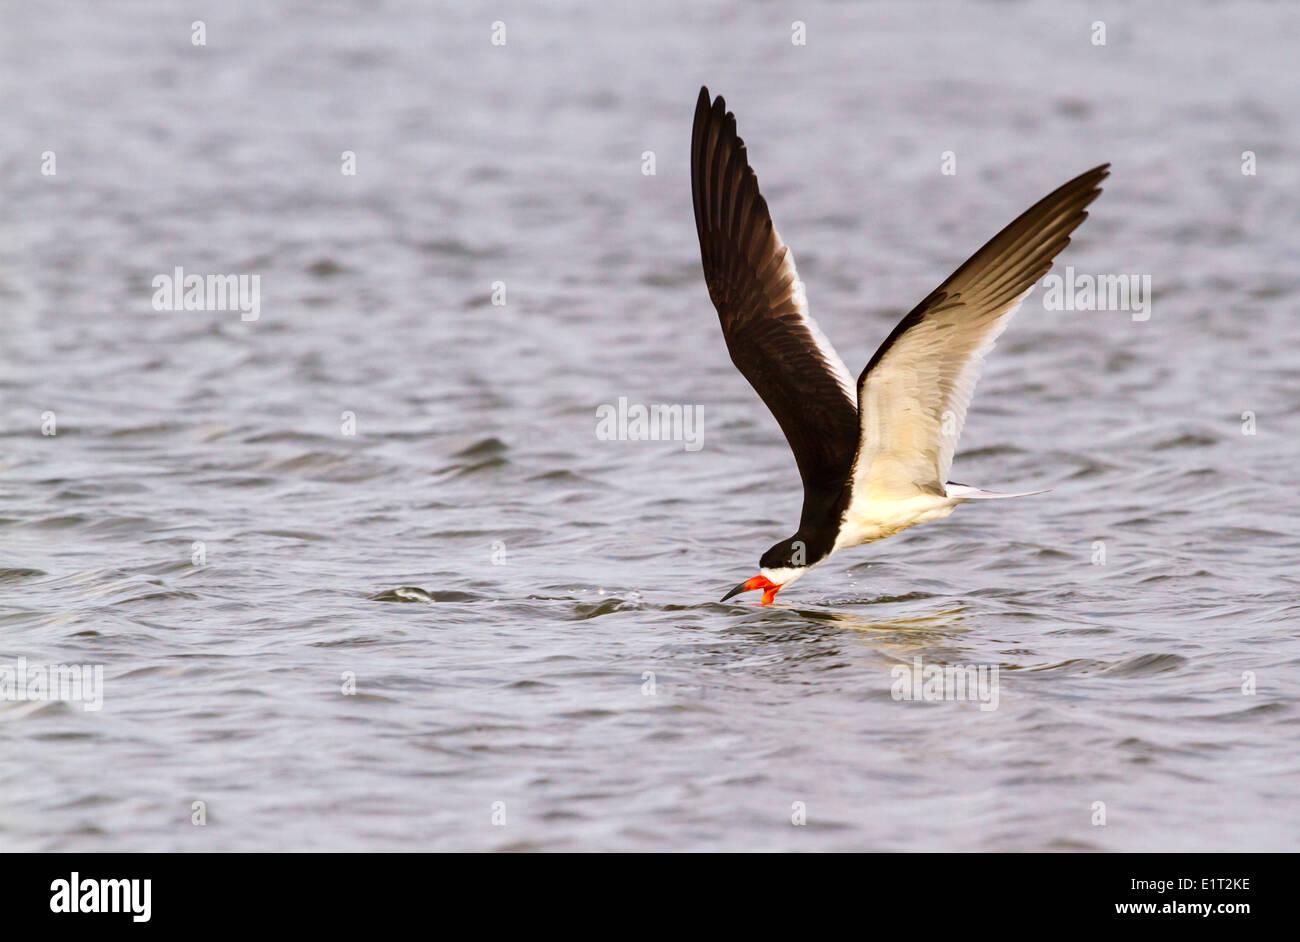 Black skimmer (Rynchops niger) fishing at sunrise along the shore, Galveston, Texas, USA. - Stock Image